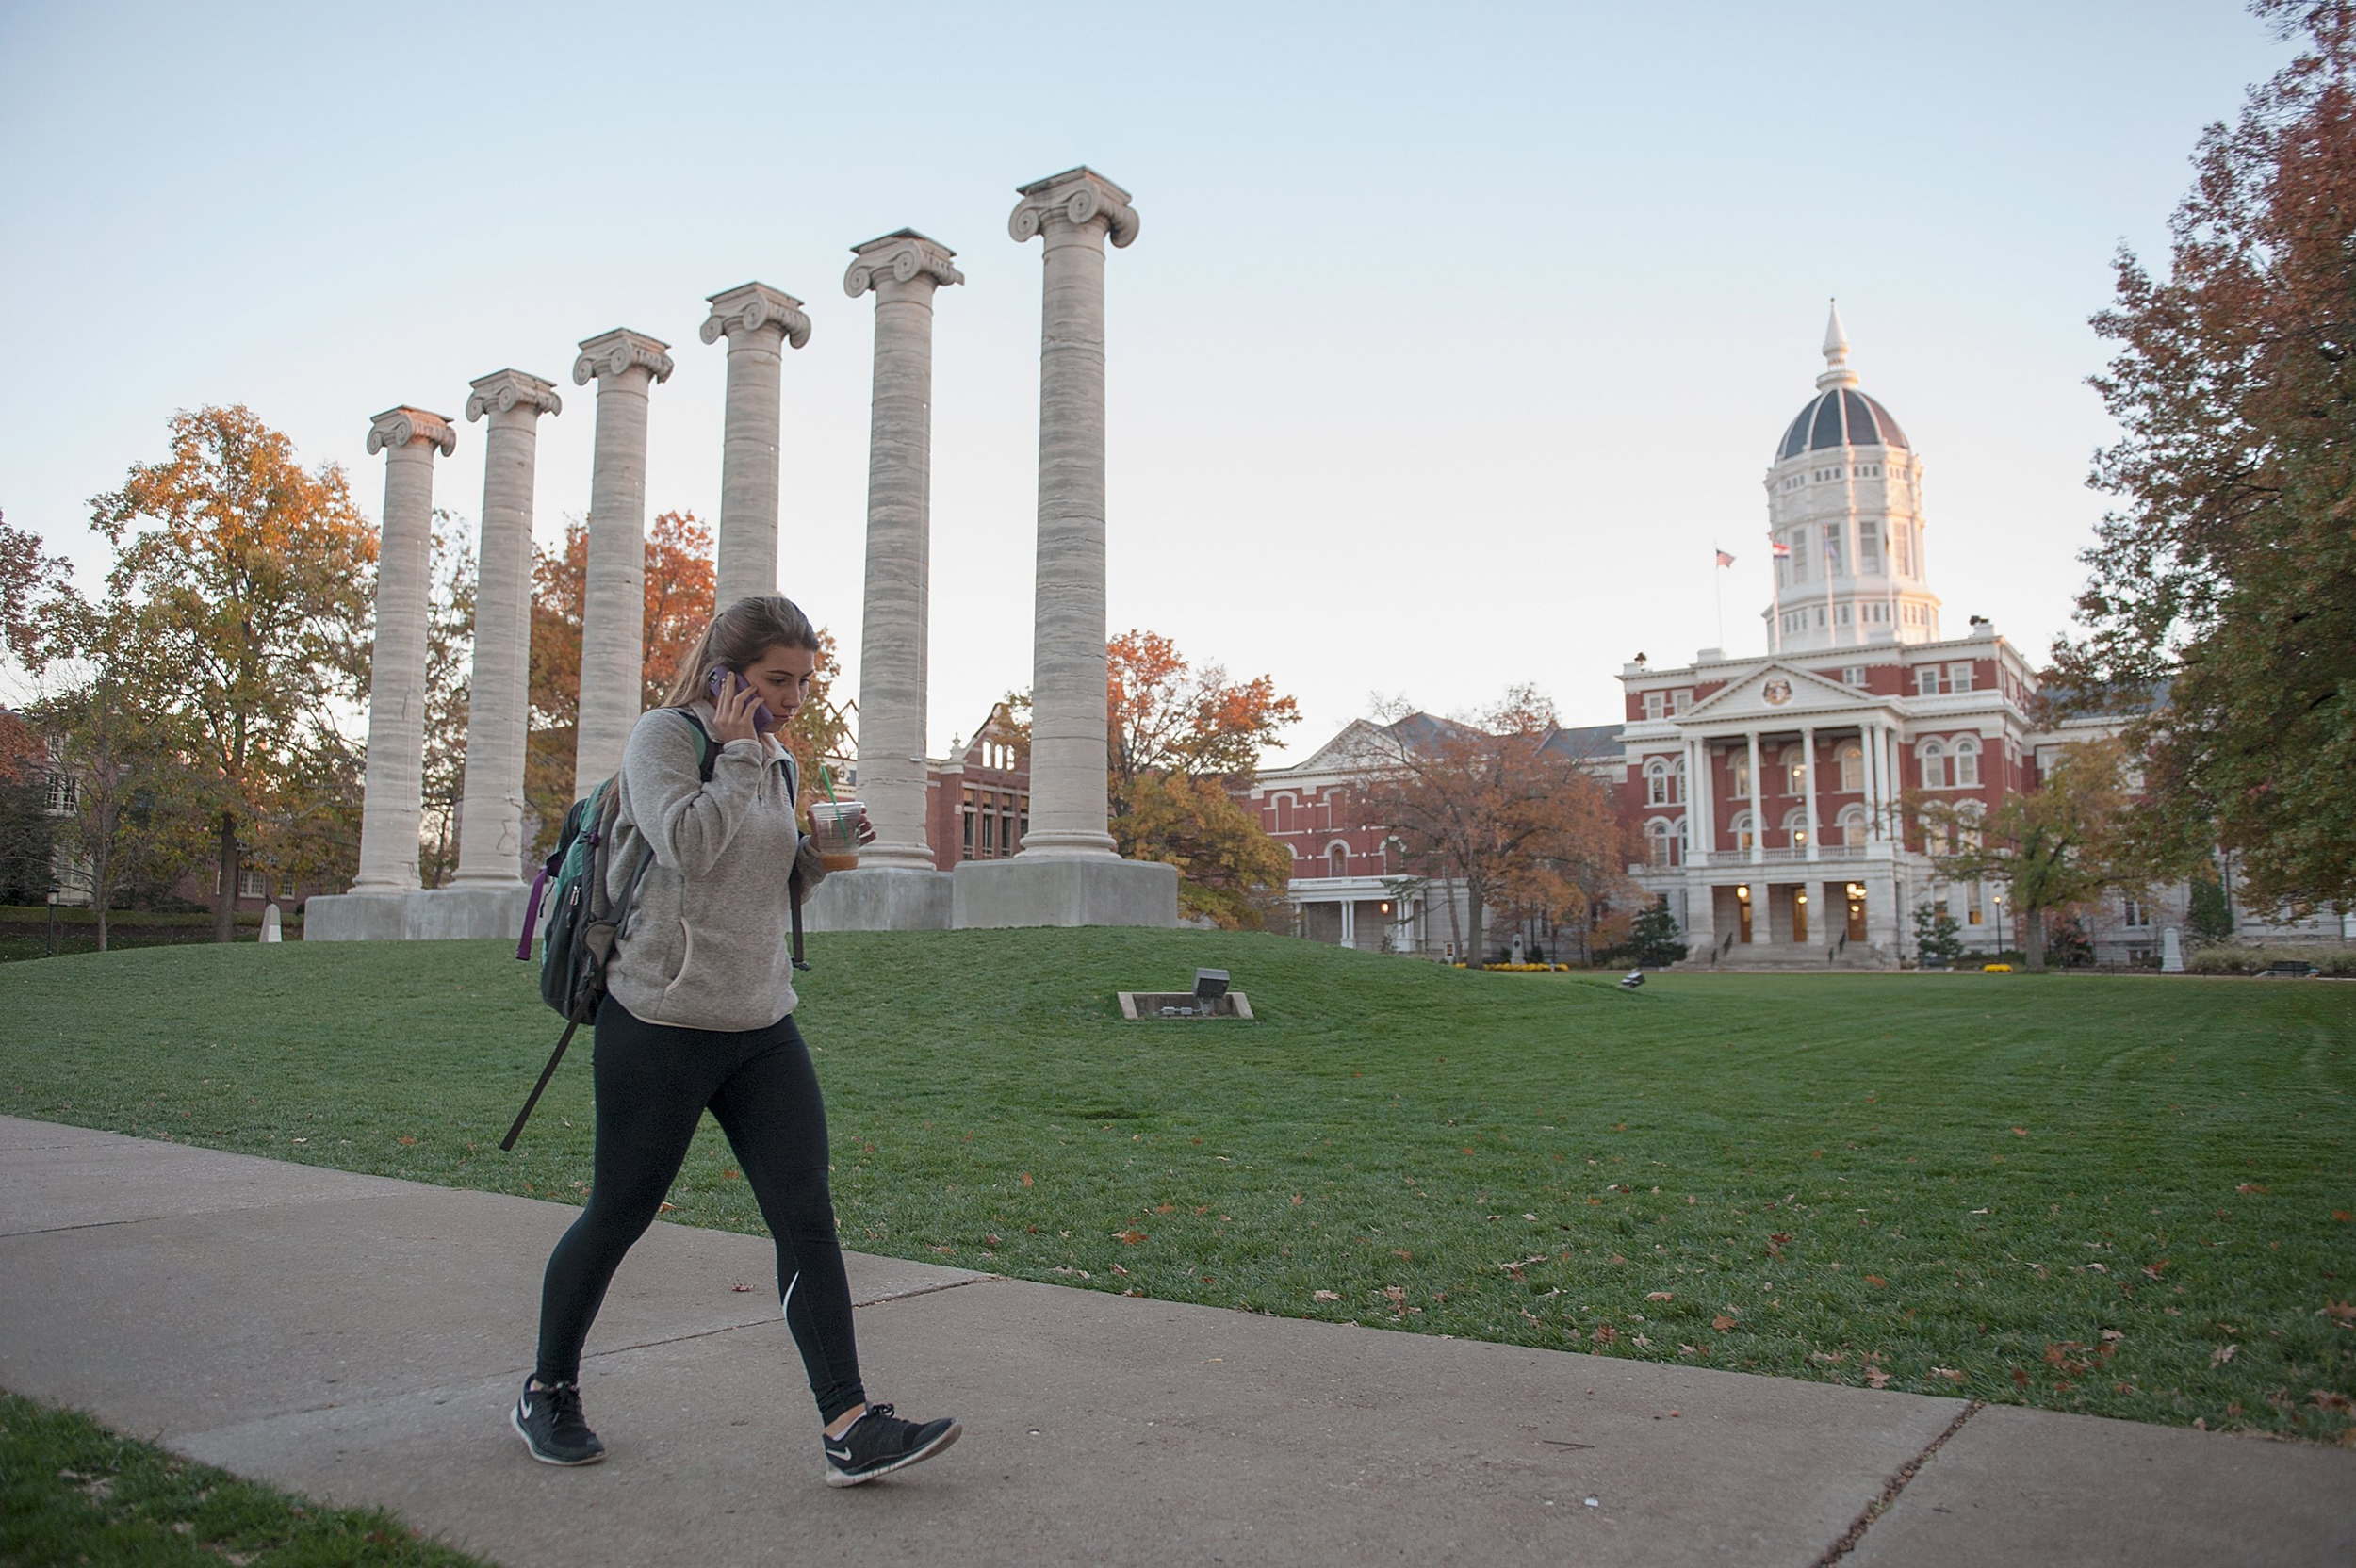 University of Missouri police officer fired for blackface photo